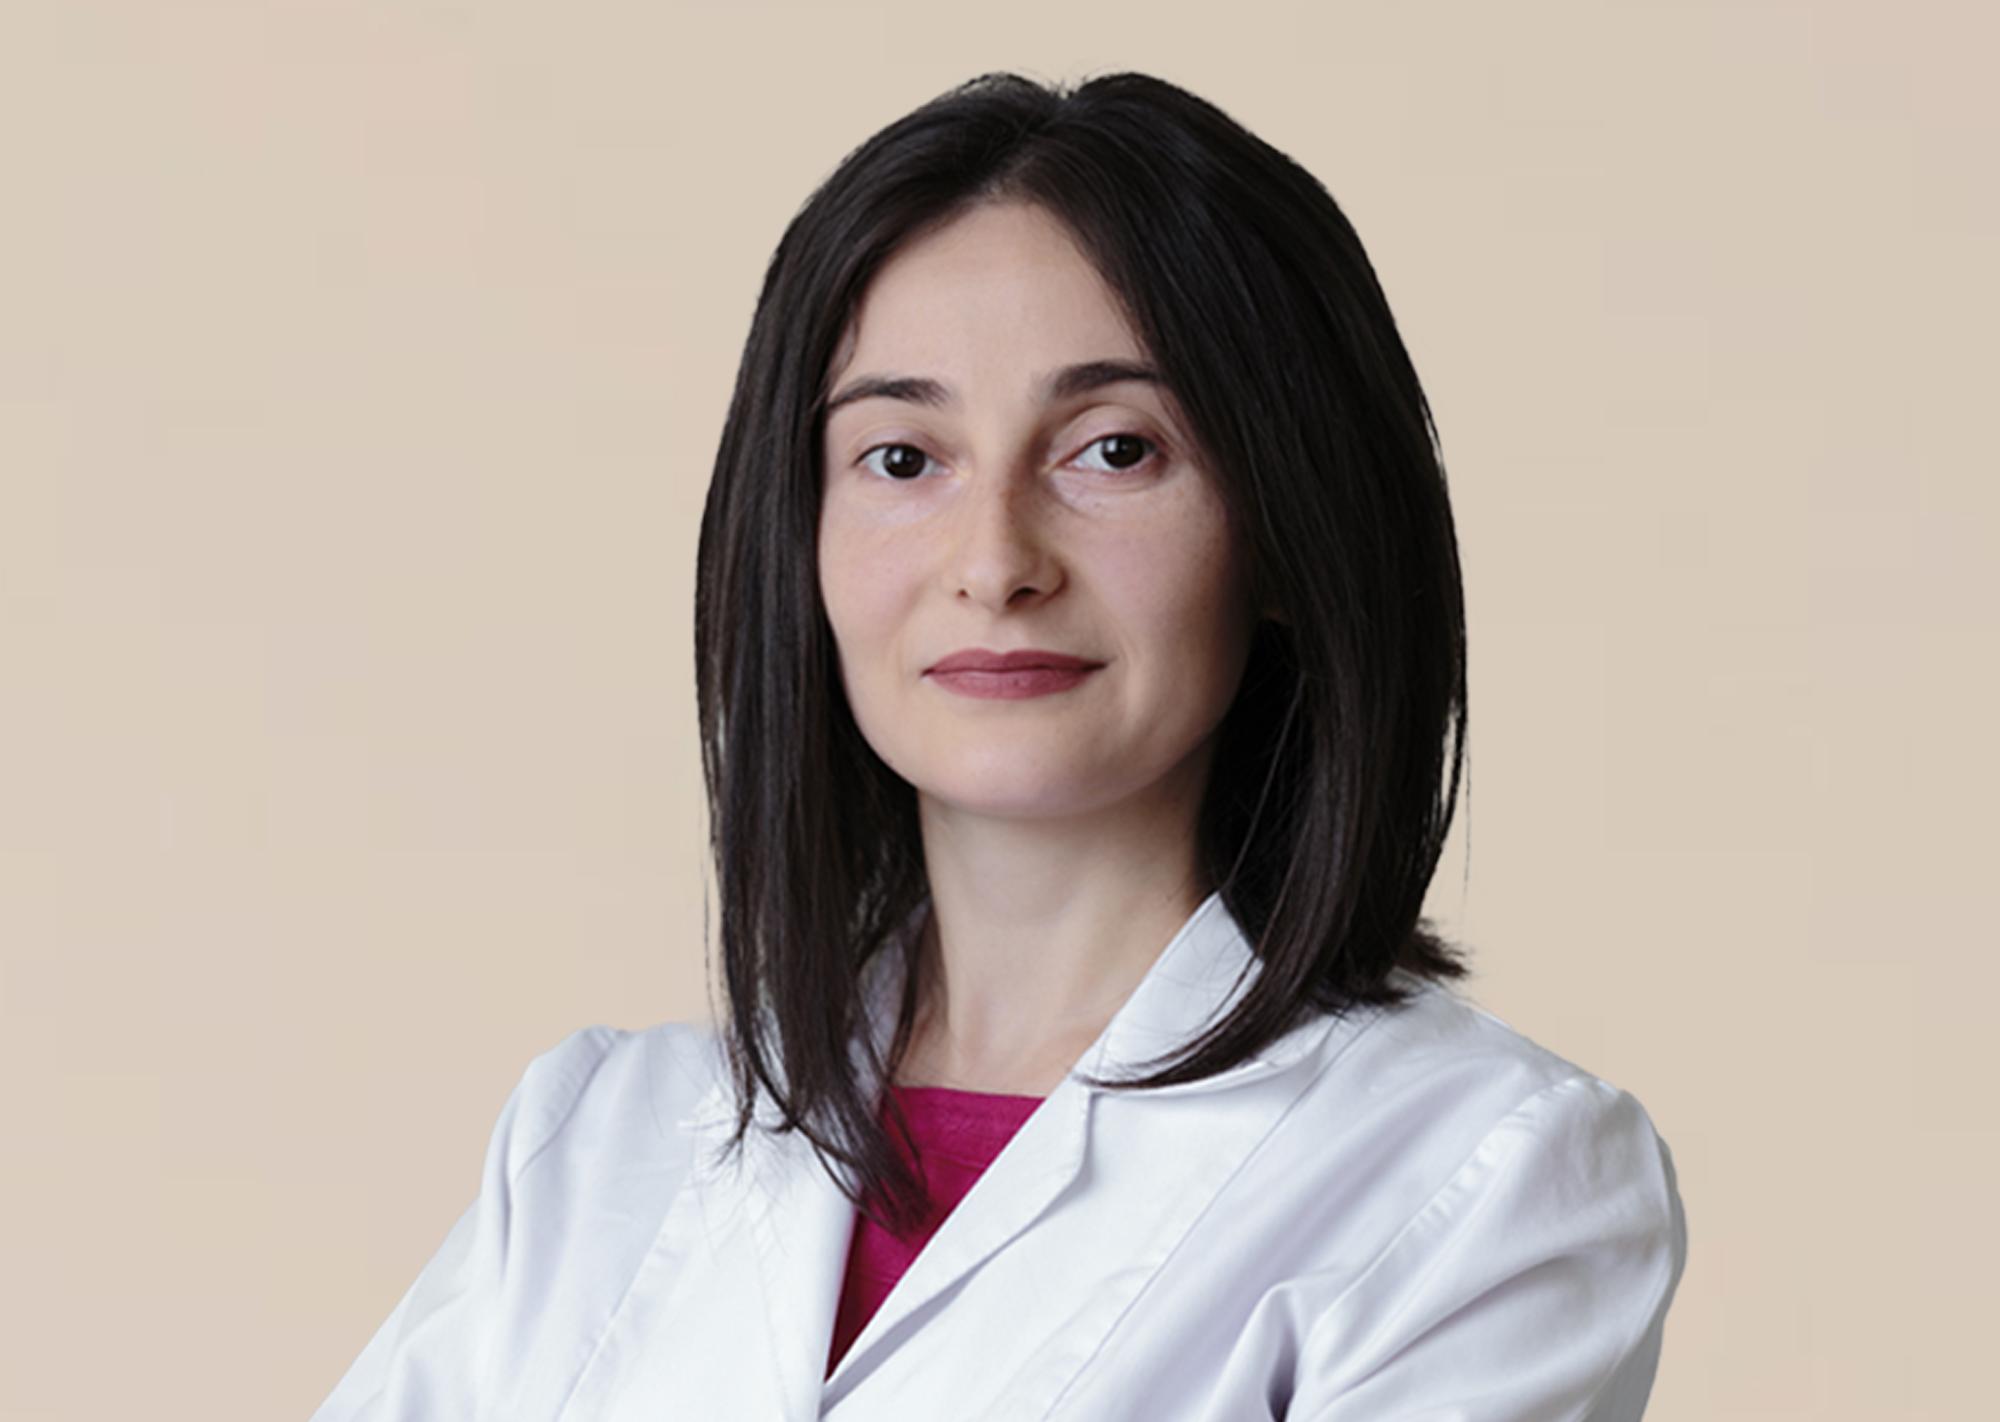 Теона Джаниашвили